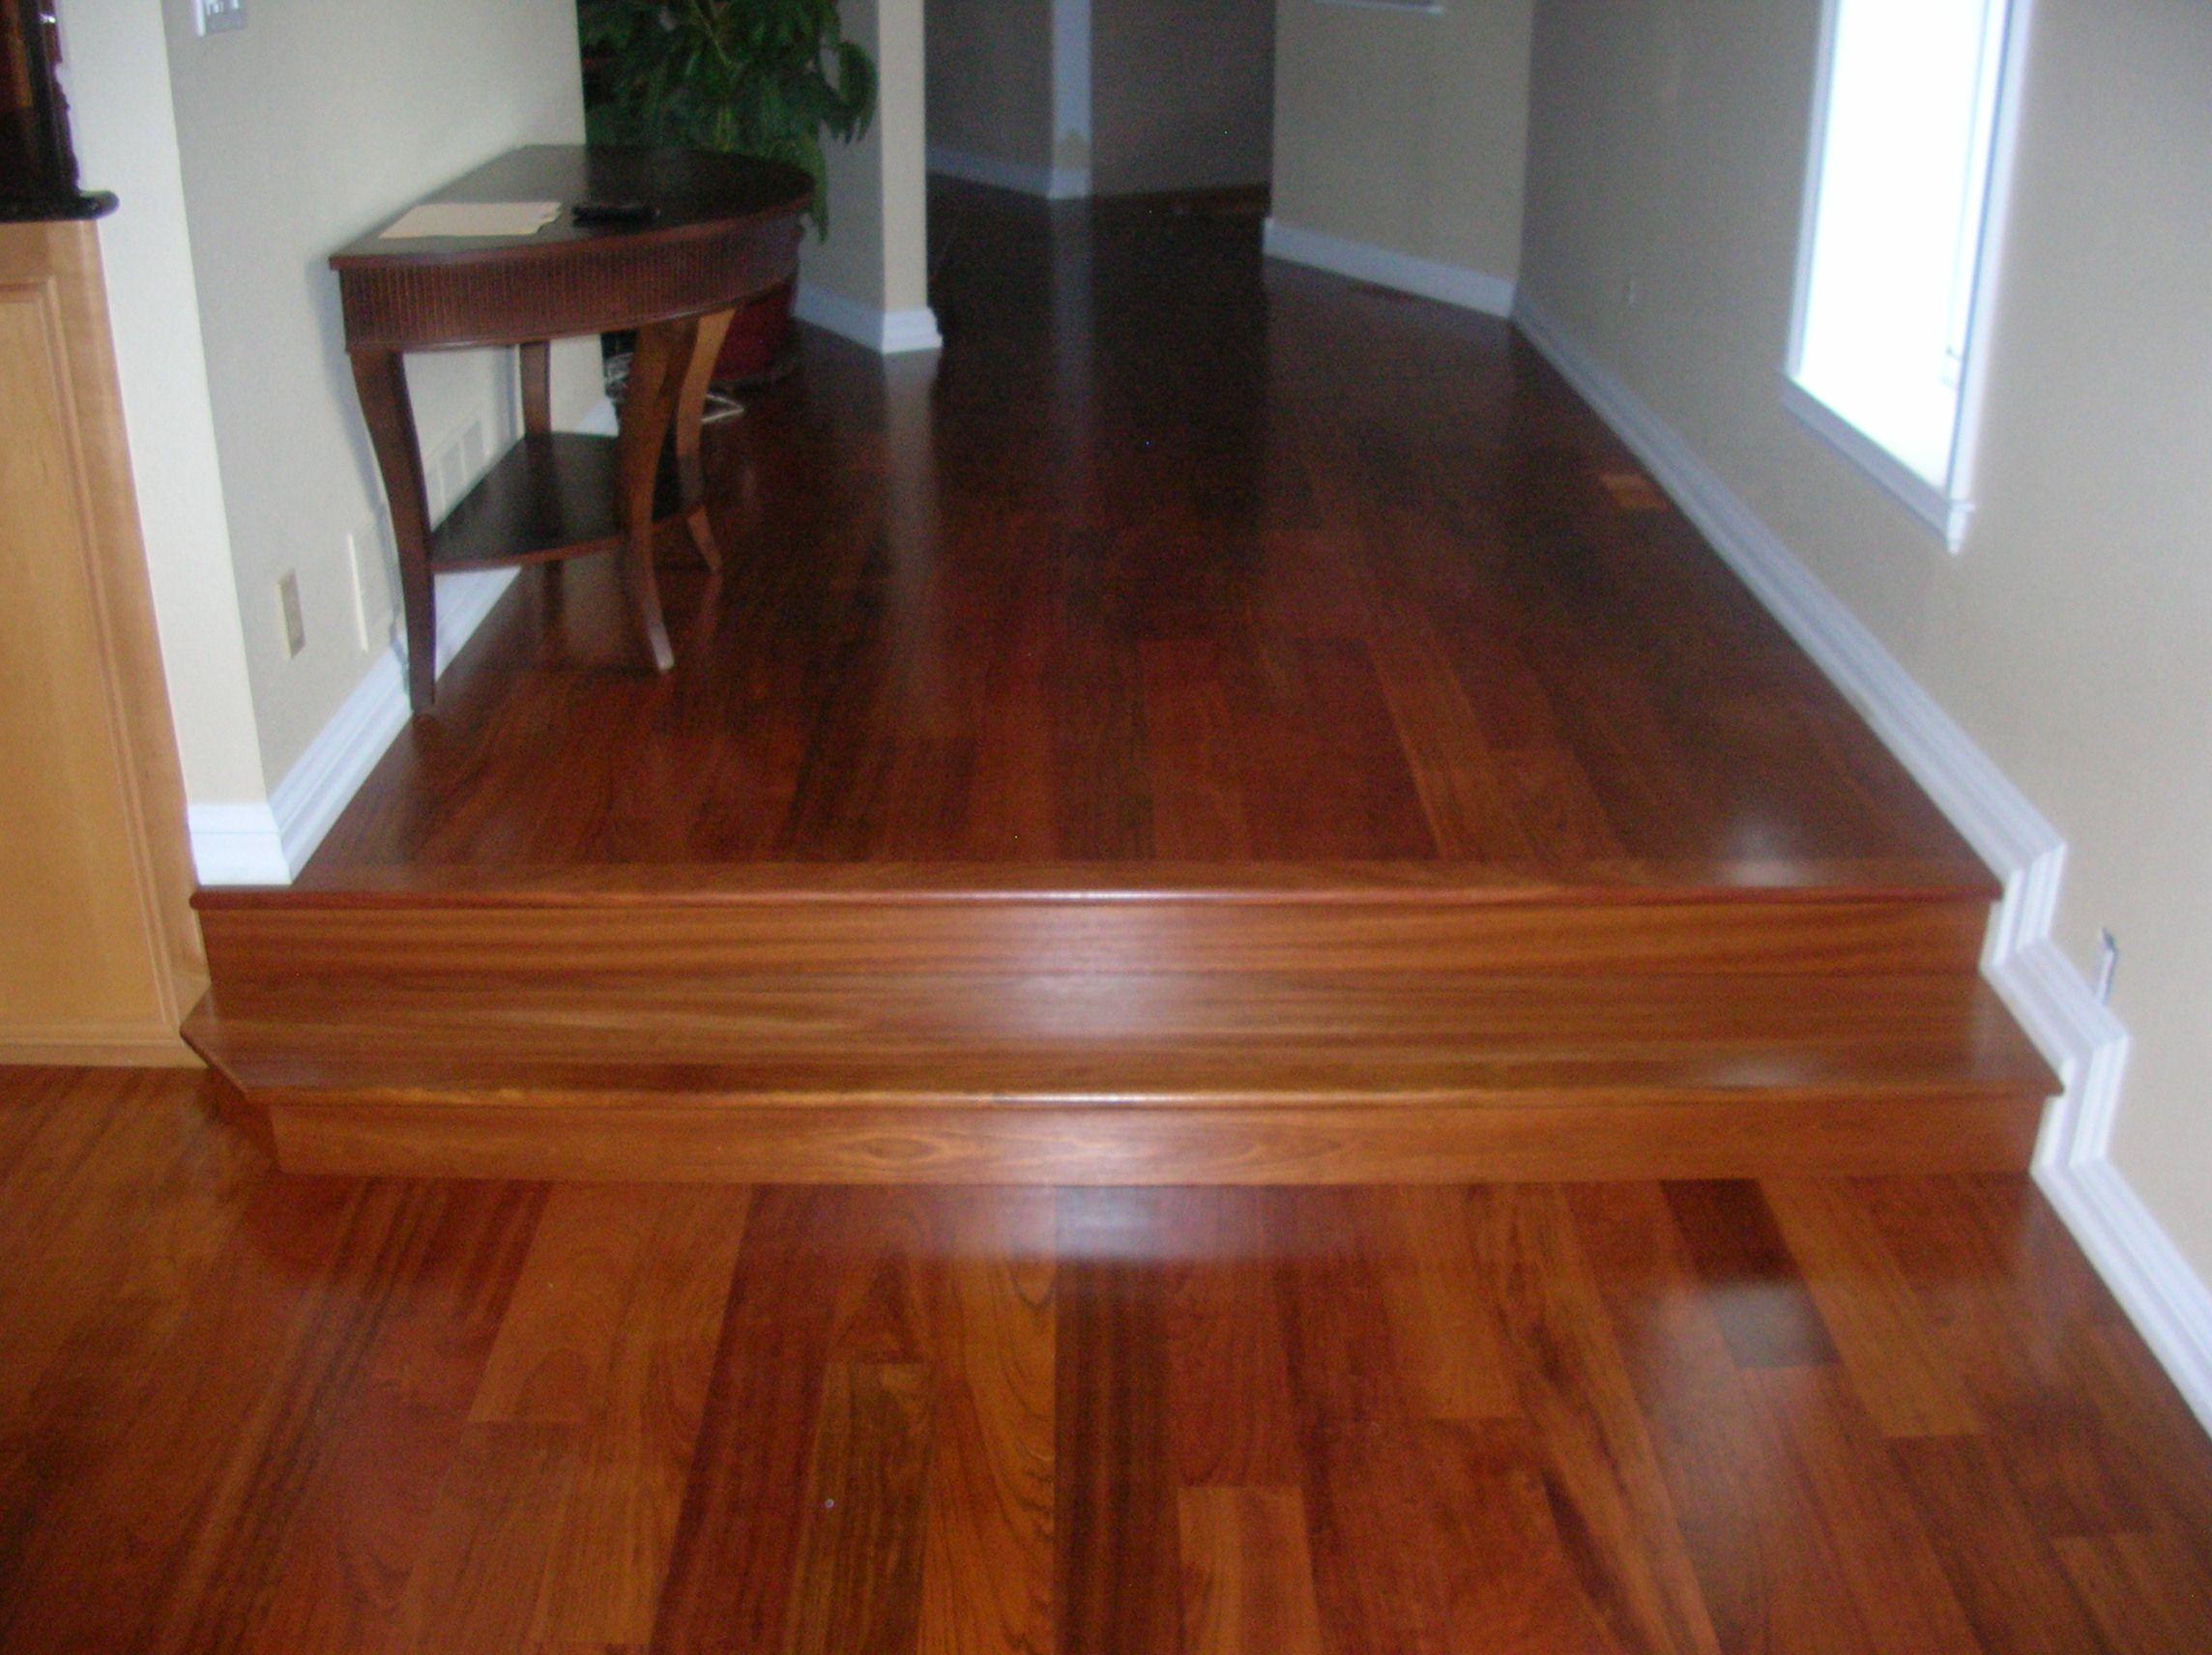 Ideal floors,,,no carpet other then area carpet. Brazilian